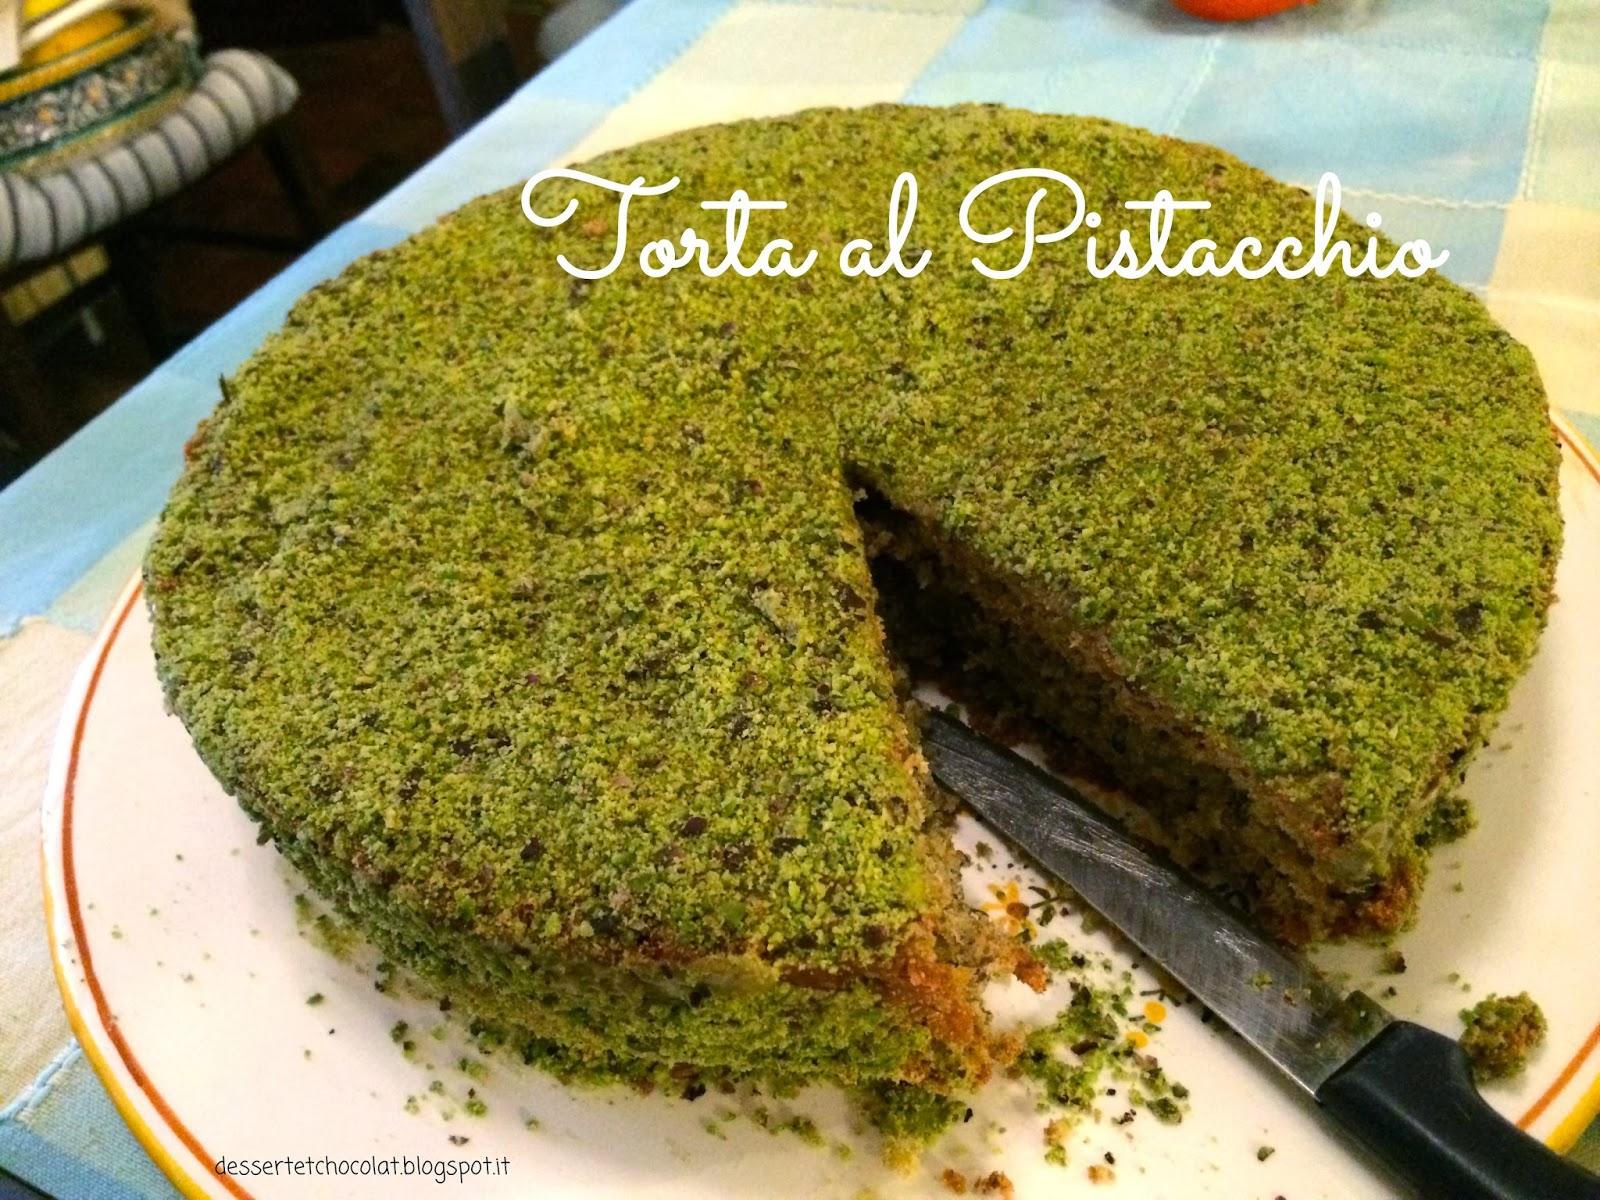 Ben noto Dessert et Chocolat: Torta al pistacchio con crema di pistacchio NN75